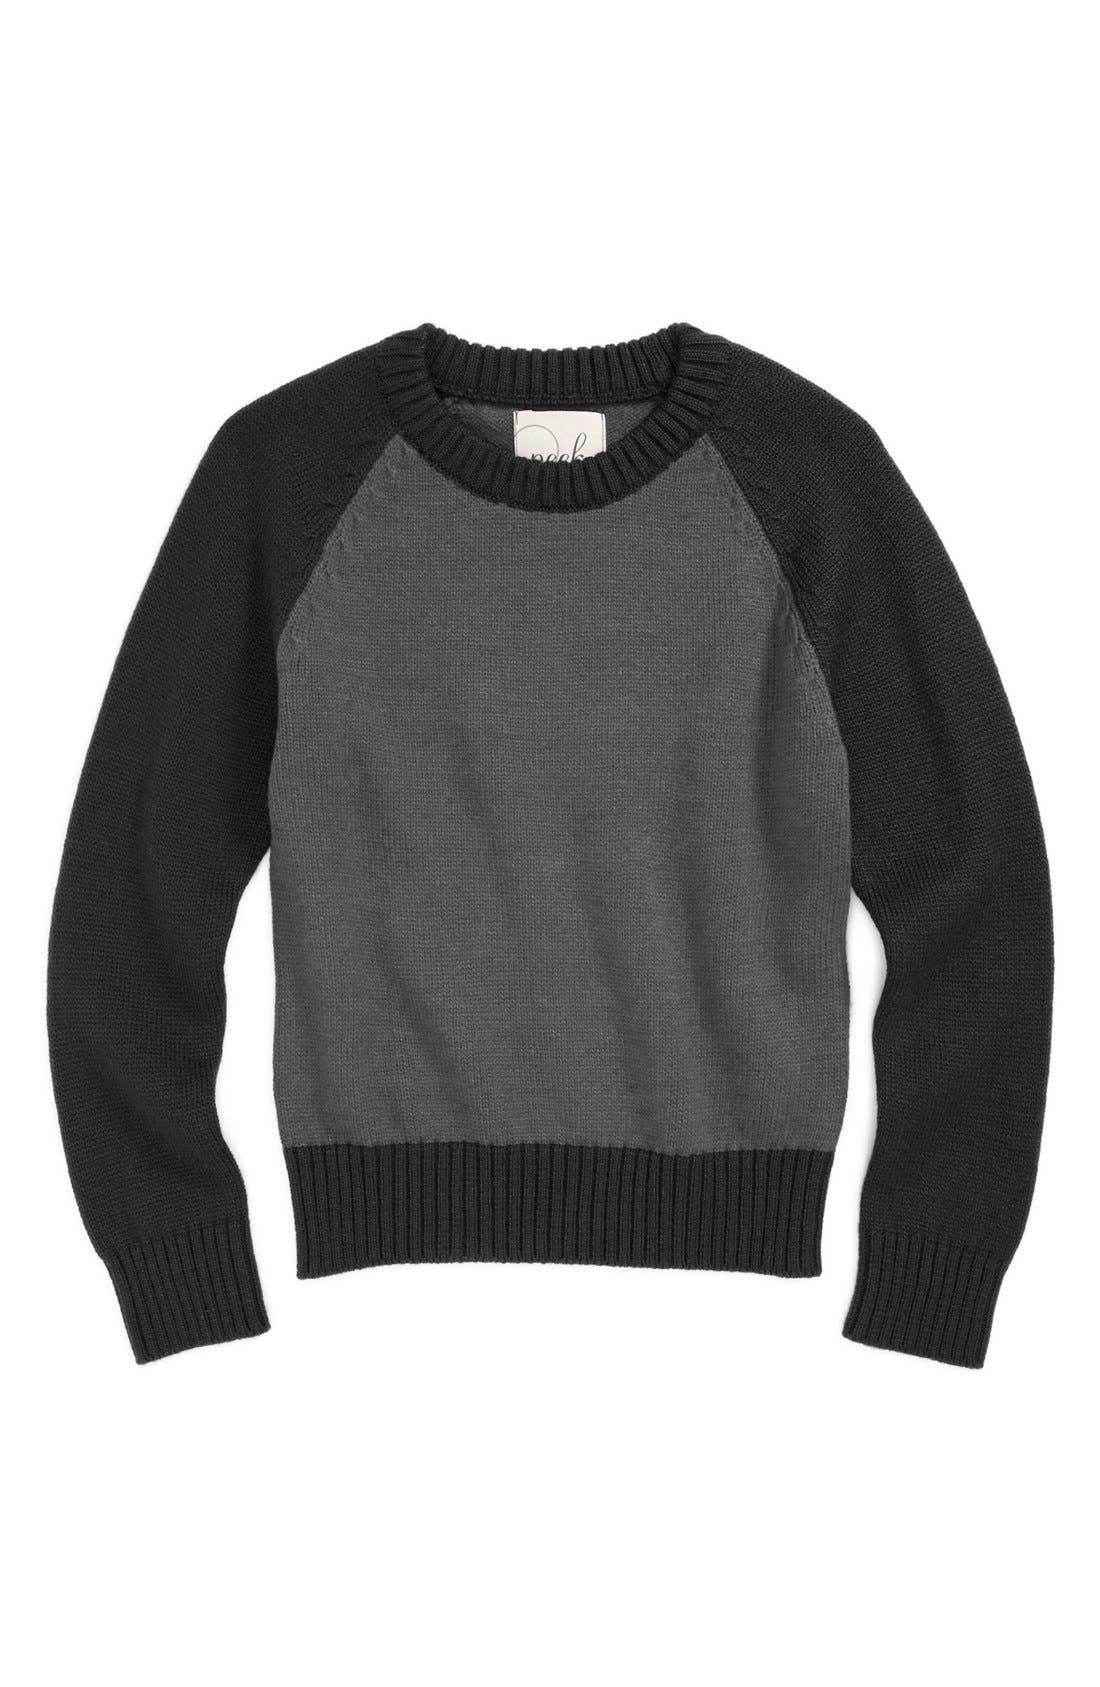 Main Image - Peek 'Clayton' Sweater (Toddler Boys, Little Boys & Big Boys)